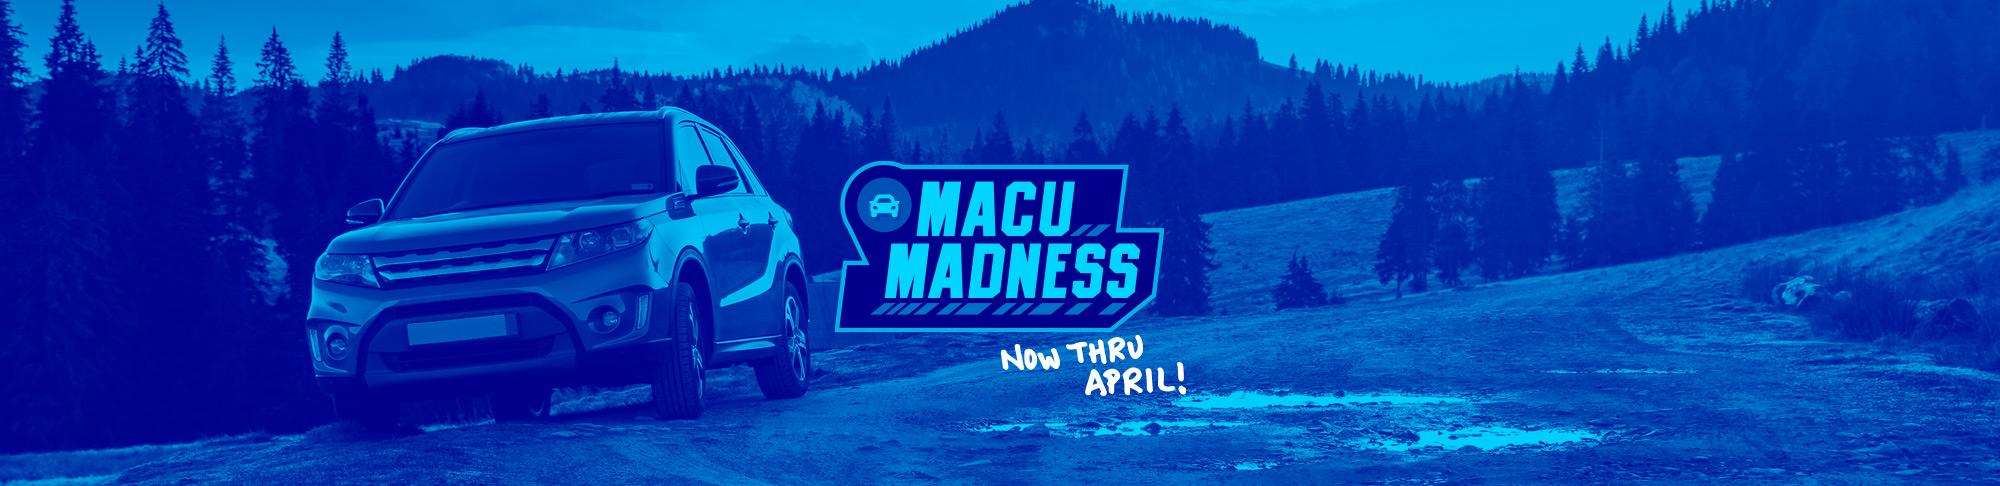 banner-macu-madness-extedended-v1